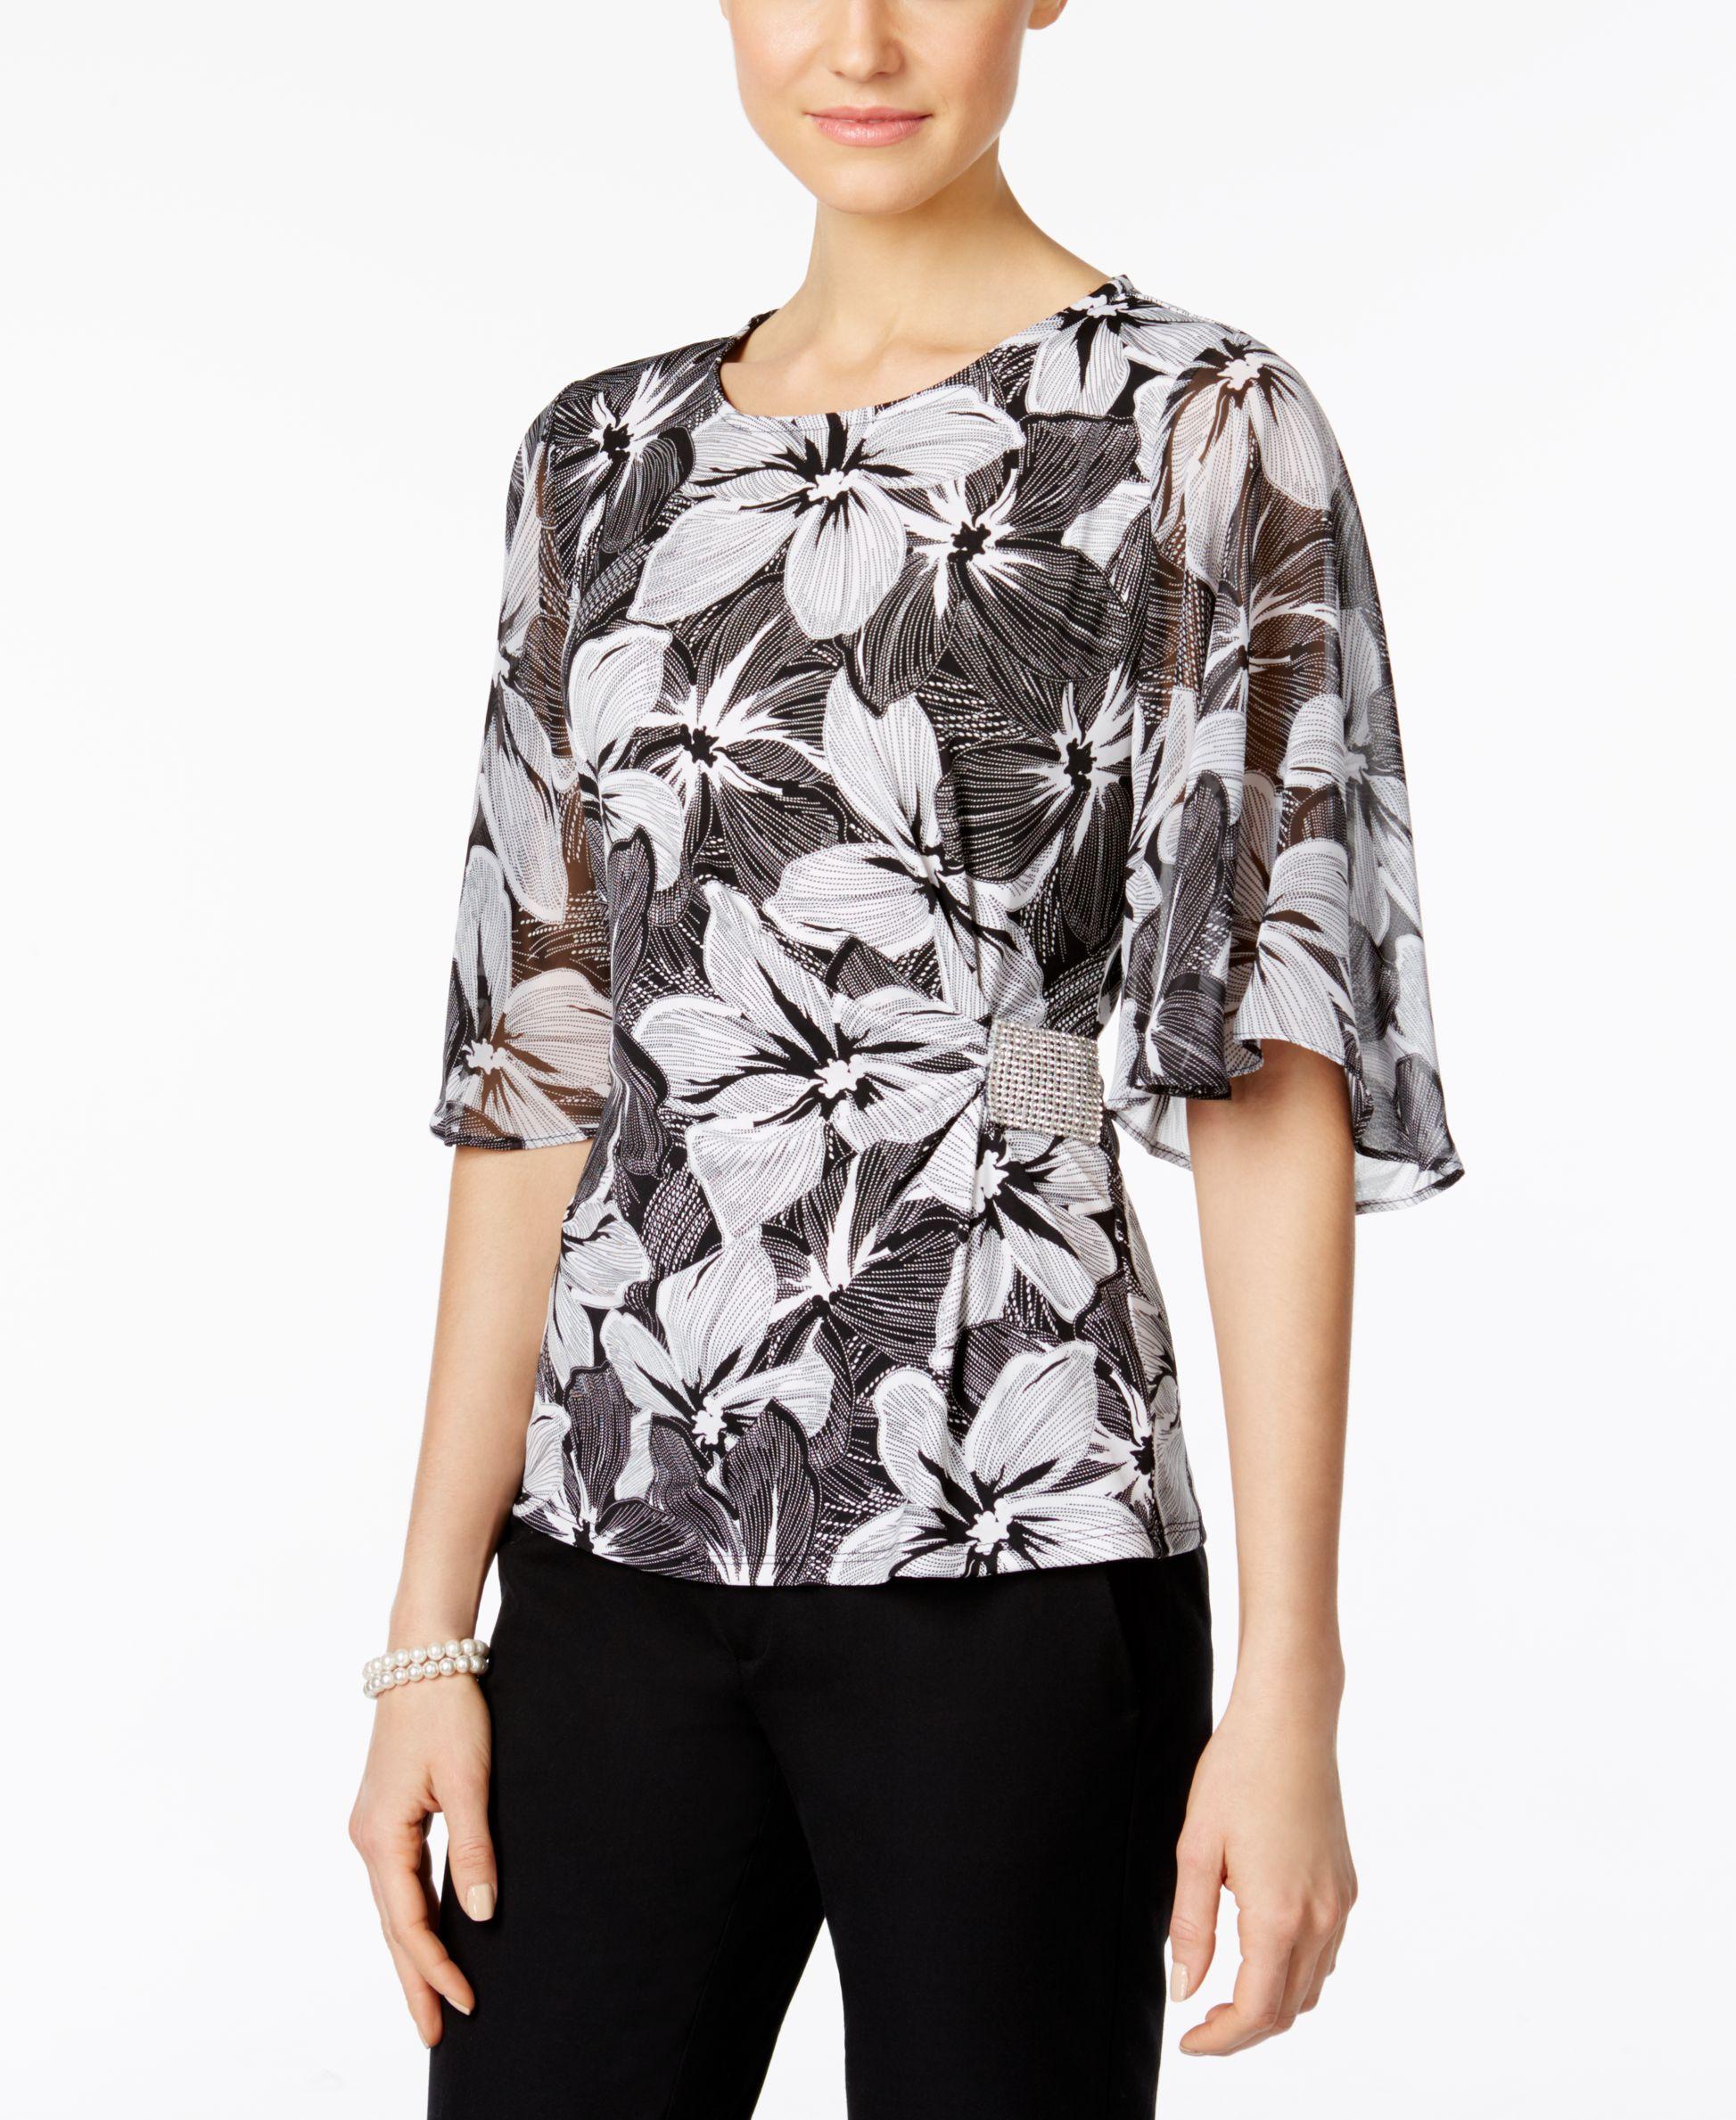 Msk Rhinestone Flutter Sleeve Evening Blouse Products Pinterest